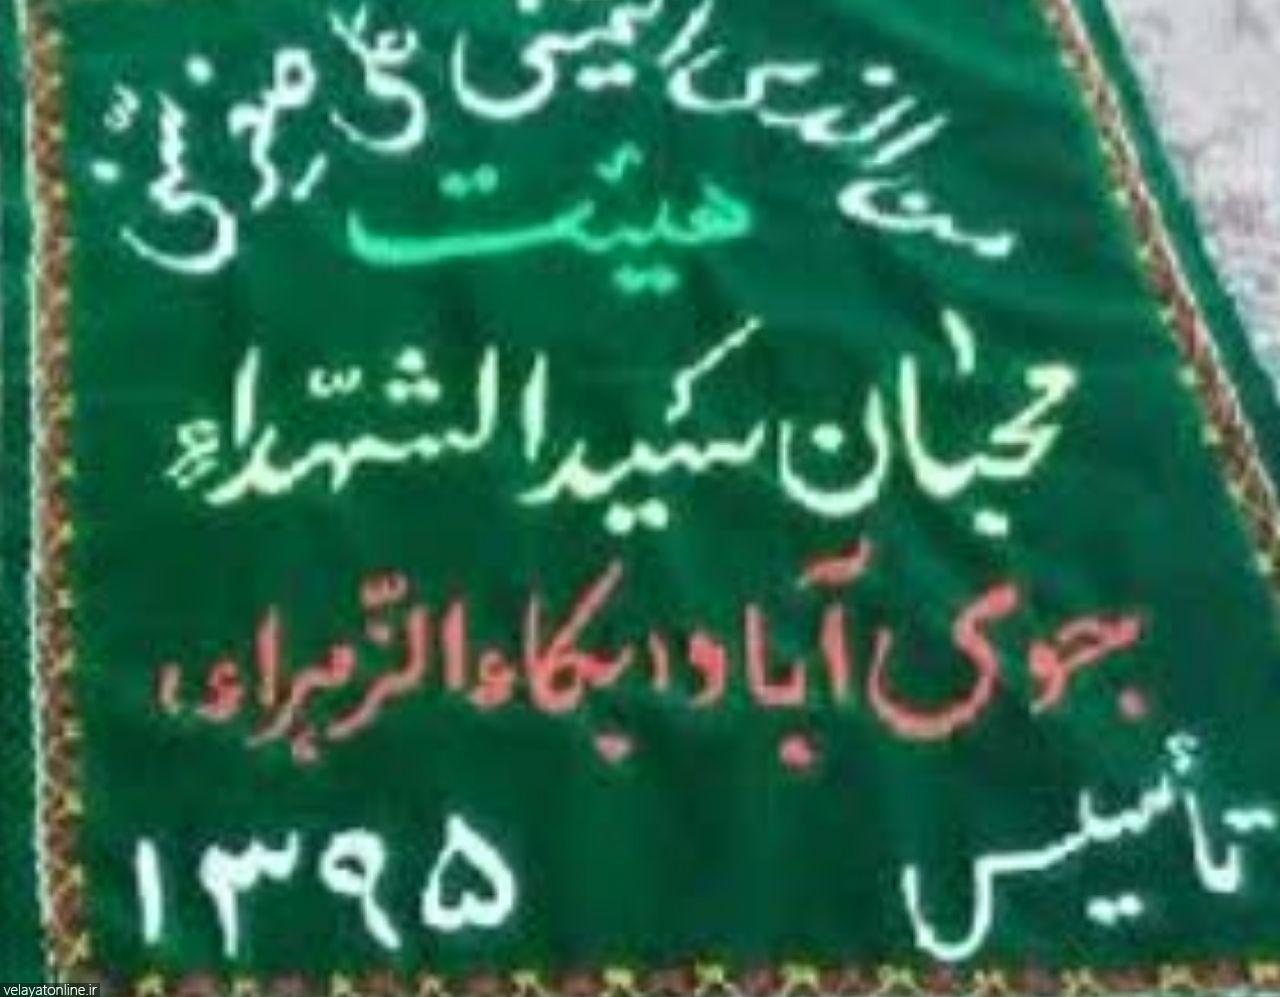 هیئت محبان سیدالشهدای عباس ابن علی(بکاء الزهرا)